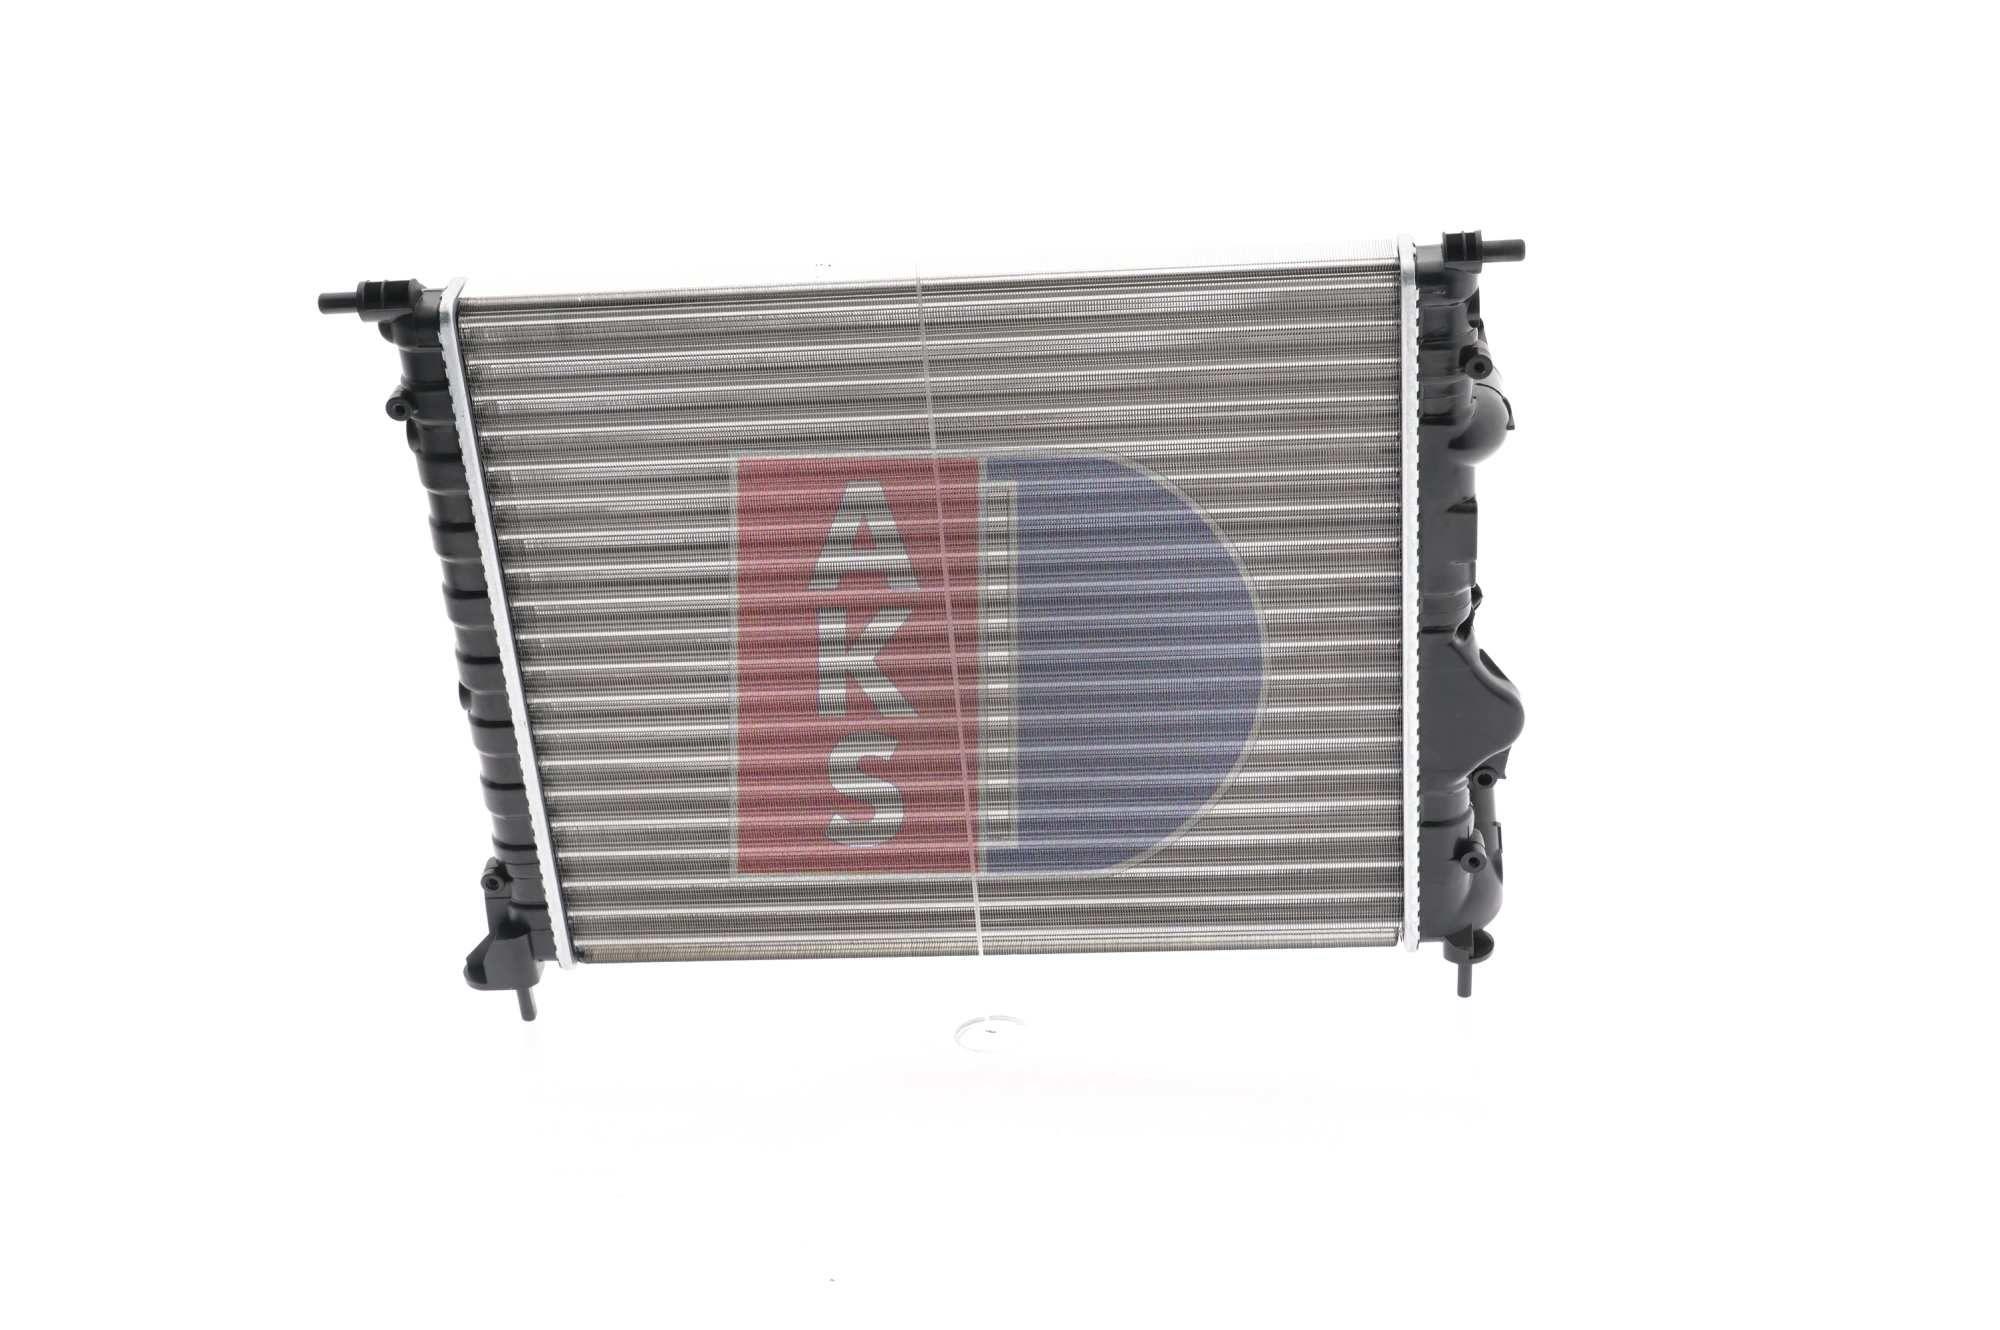 180240N Wasserkühler AKS DASIS 180240N - Große Auswahl - stark reduziert